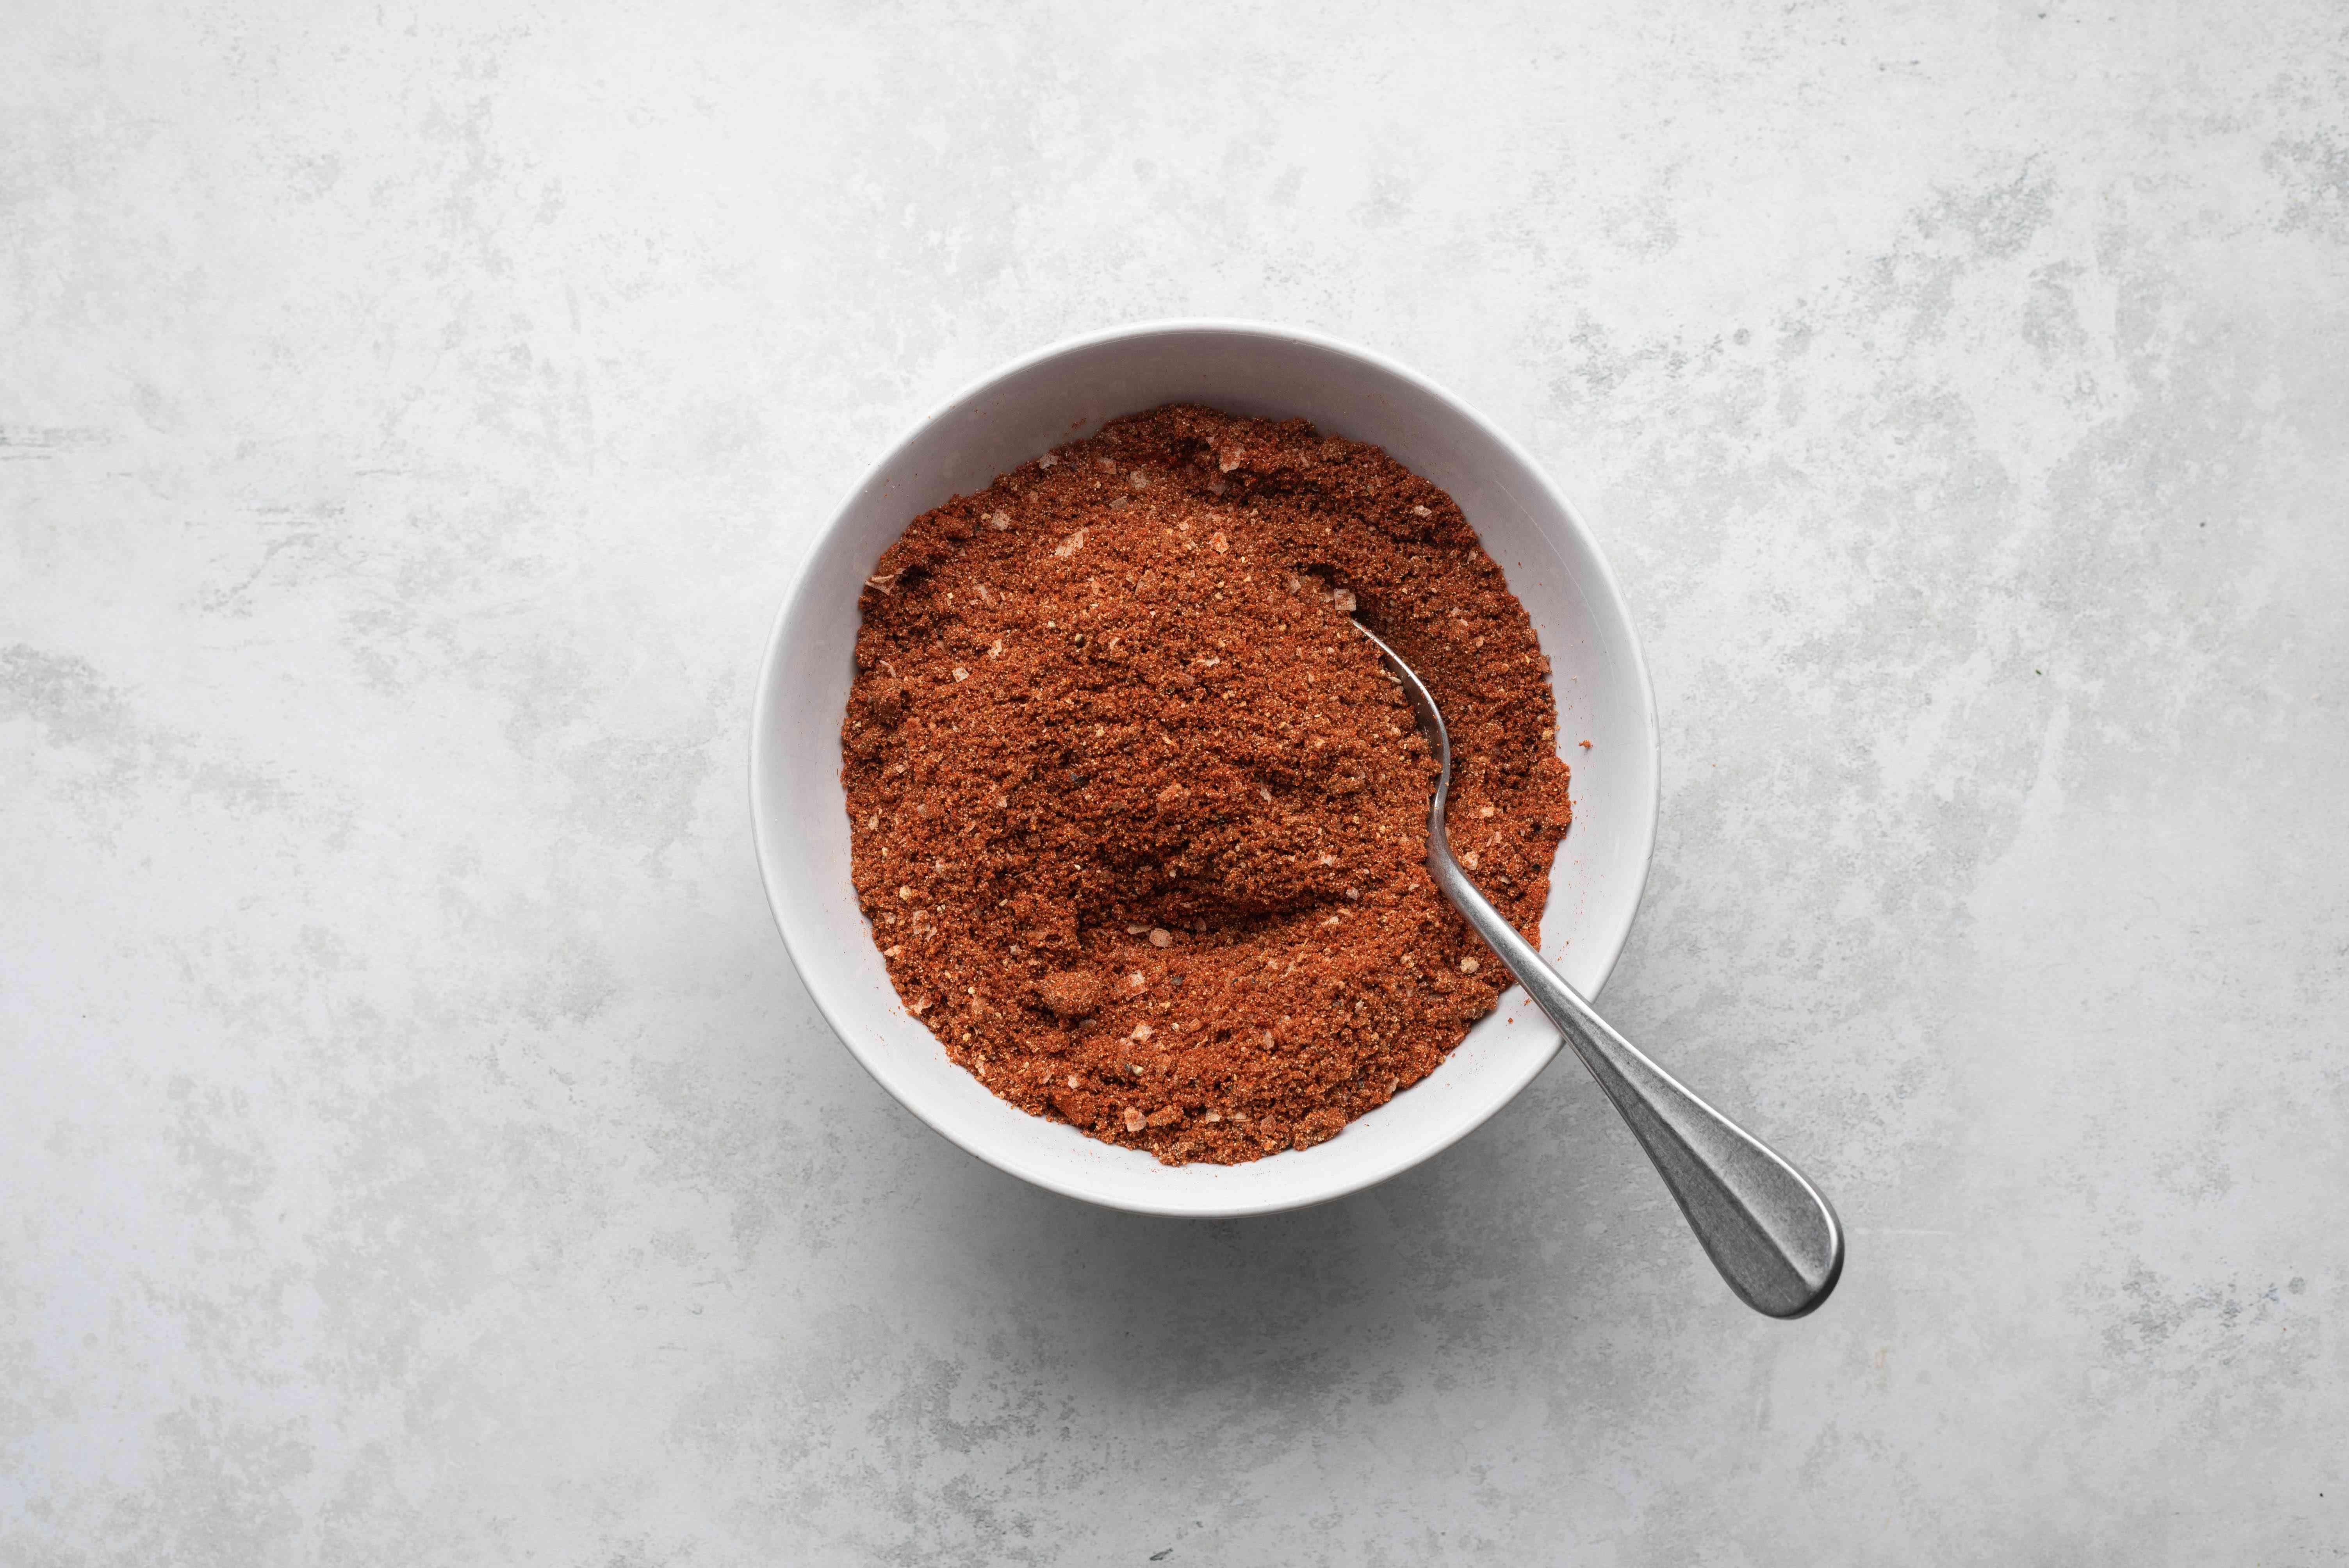 dark-brown sugar, paprika, salt, black pepper, white pepper, garlic powder, onion powder, and cayenne pepper in a small bowl